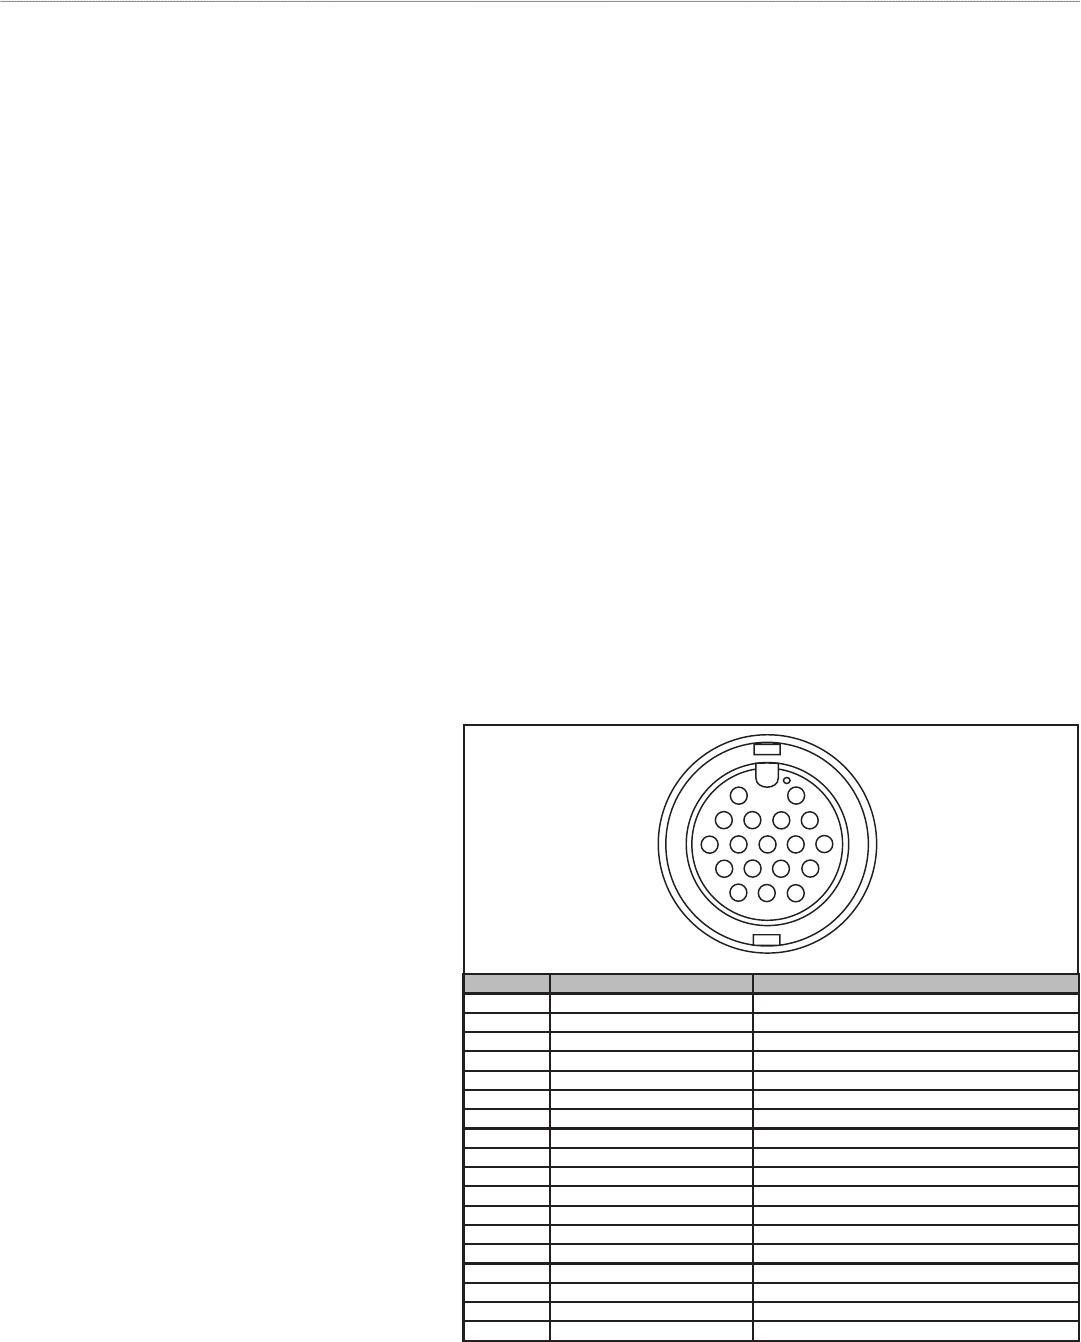 18 5 Wiring Diagram Garmin Diagrams Marine Library Powakaddy